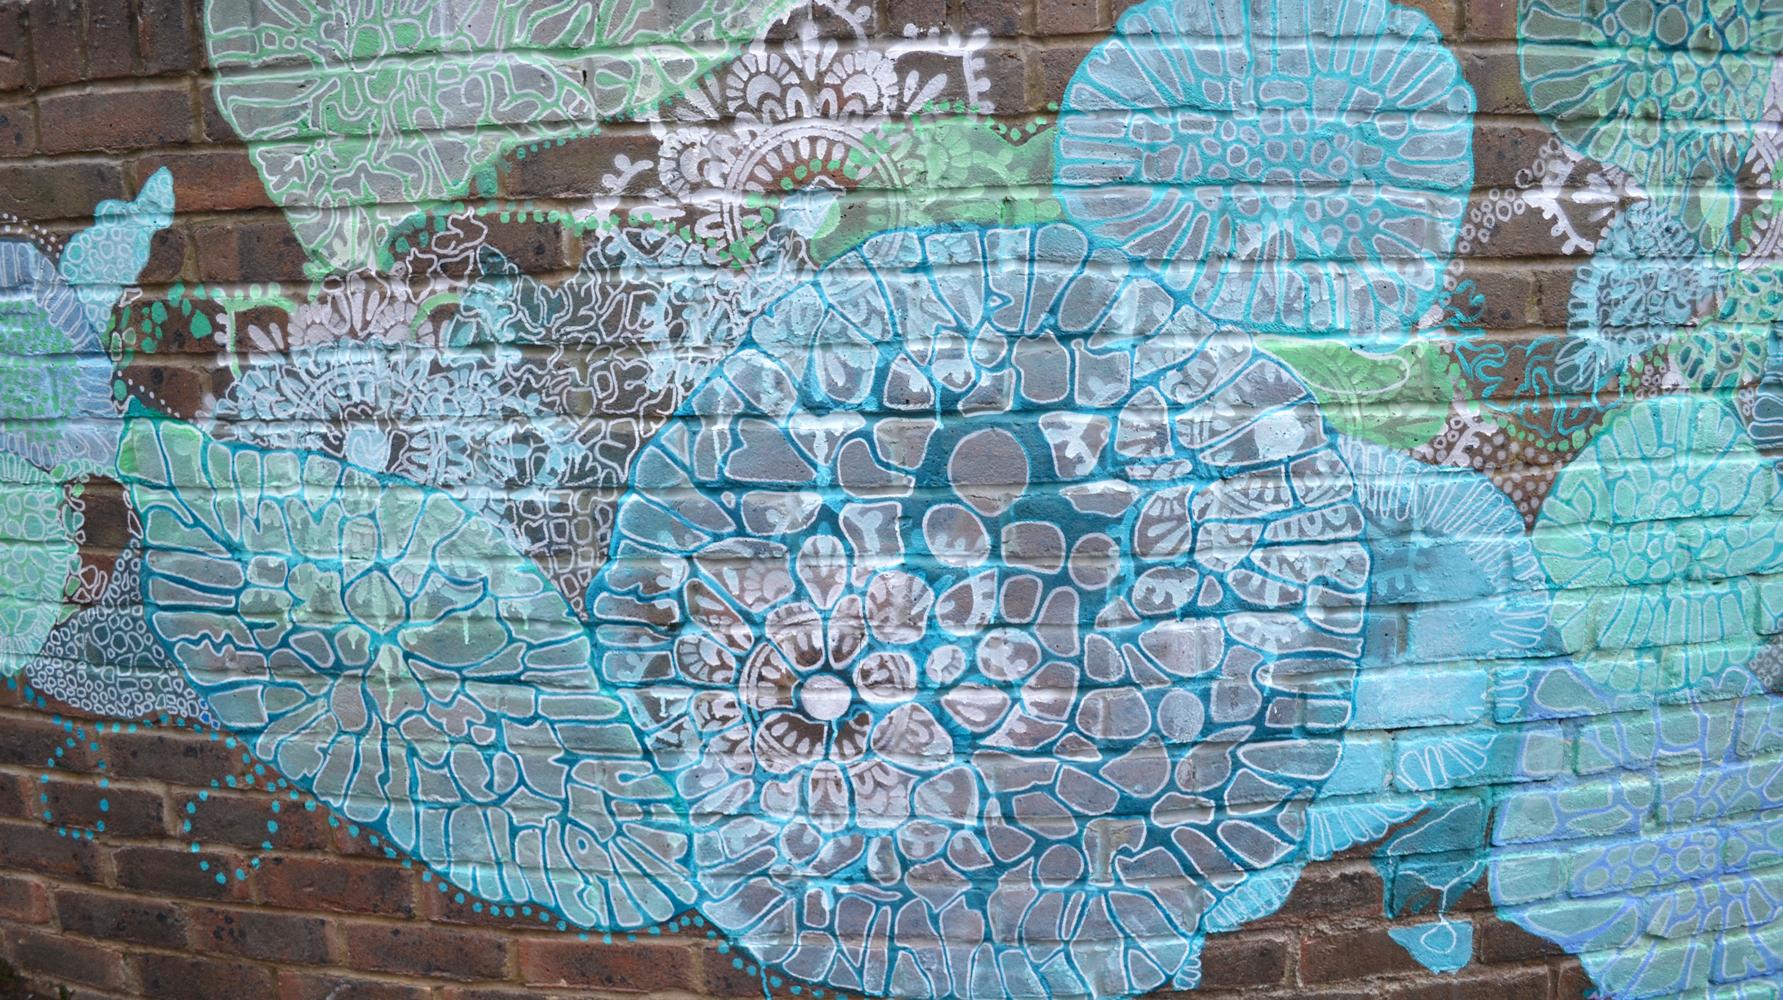 Mural_3_web.jpg